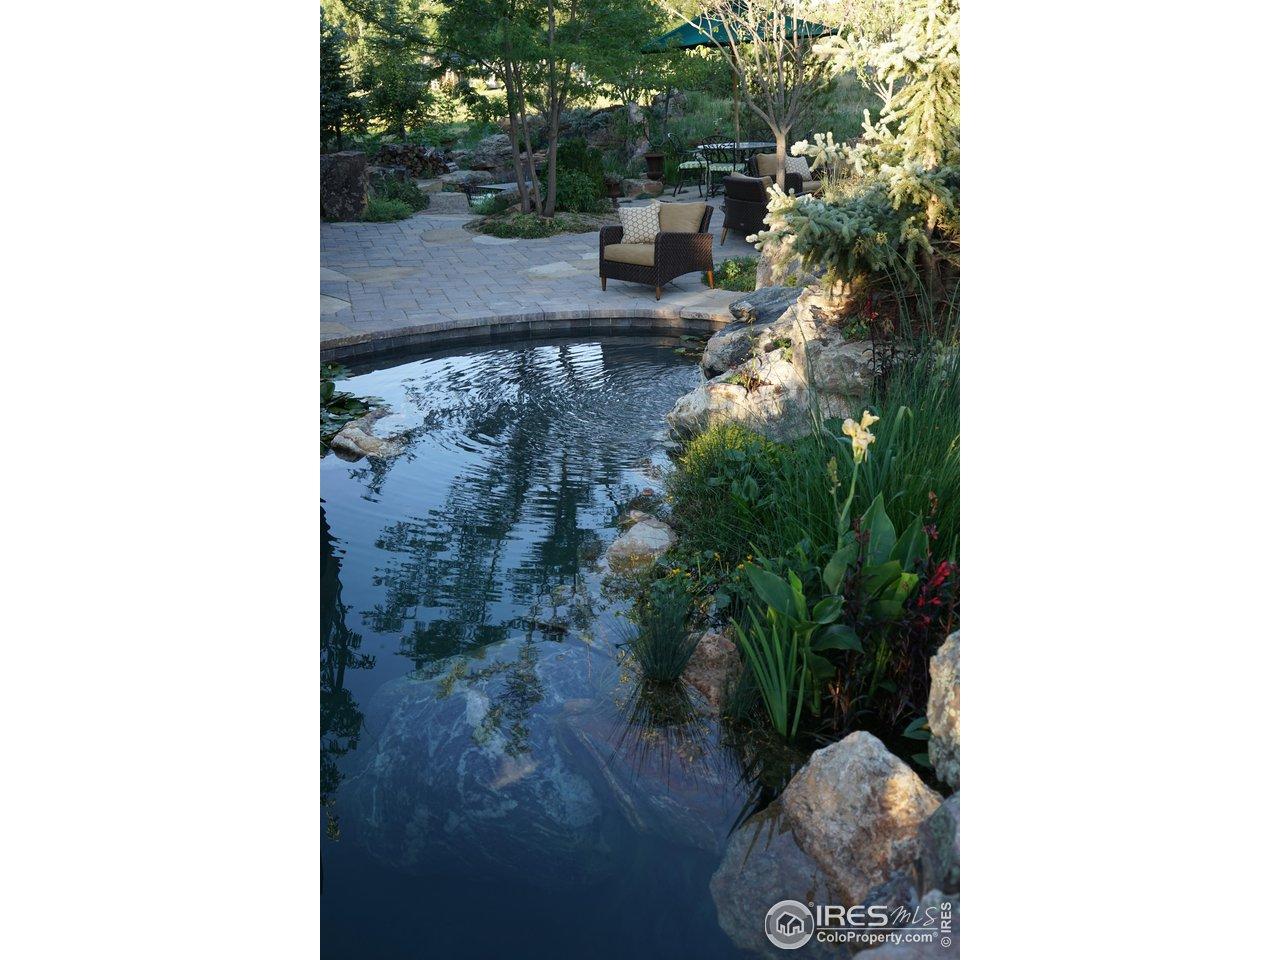 Bio filtration Pond